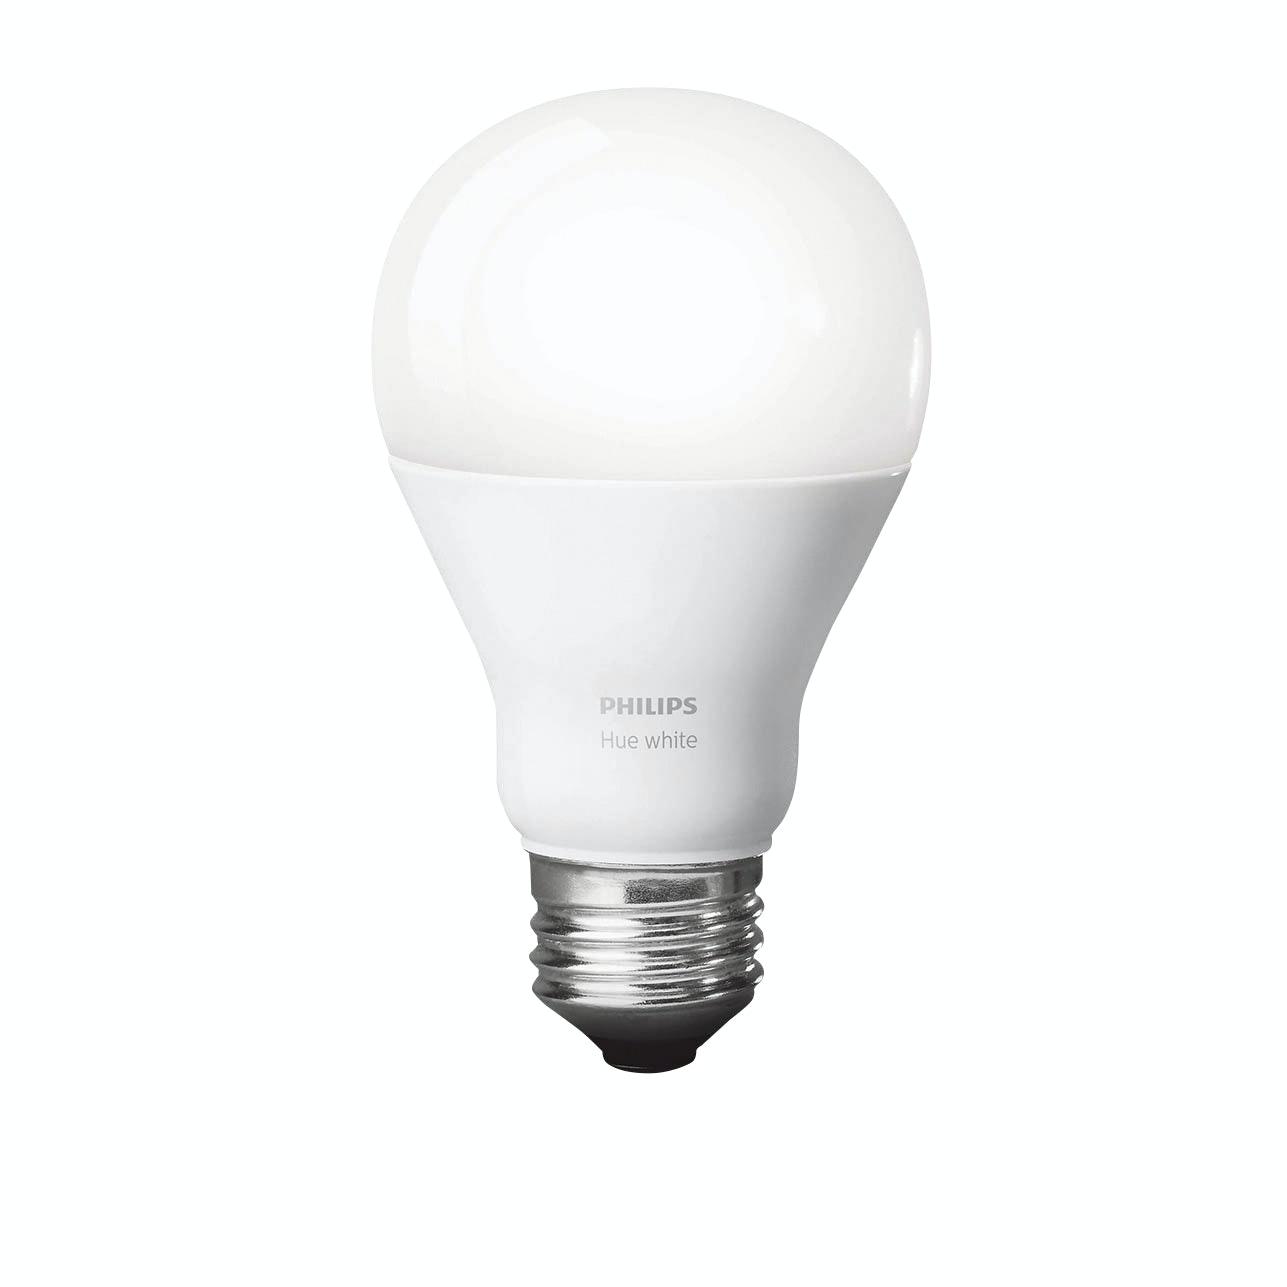 Led-Lampa Philips Hue 9.5W E27 Vit